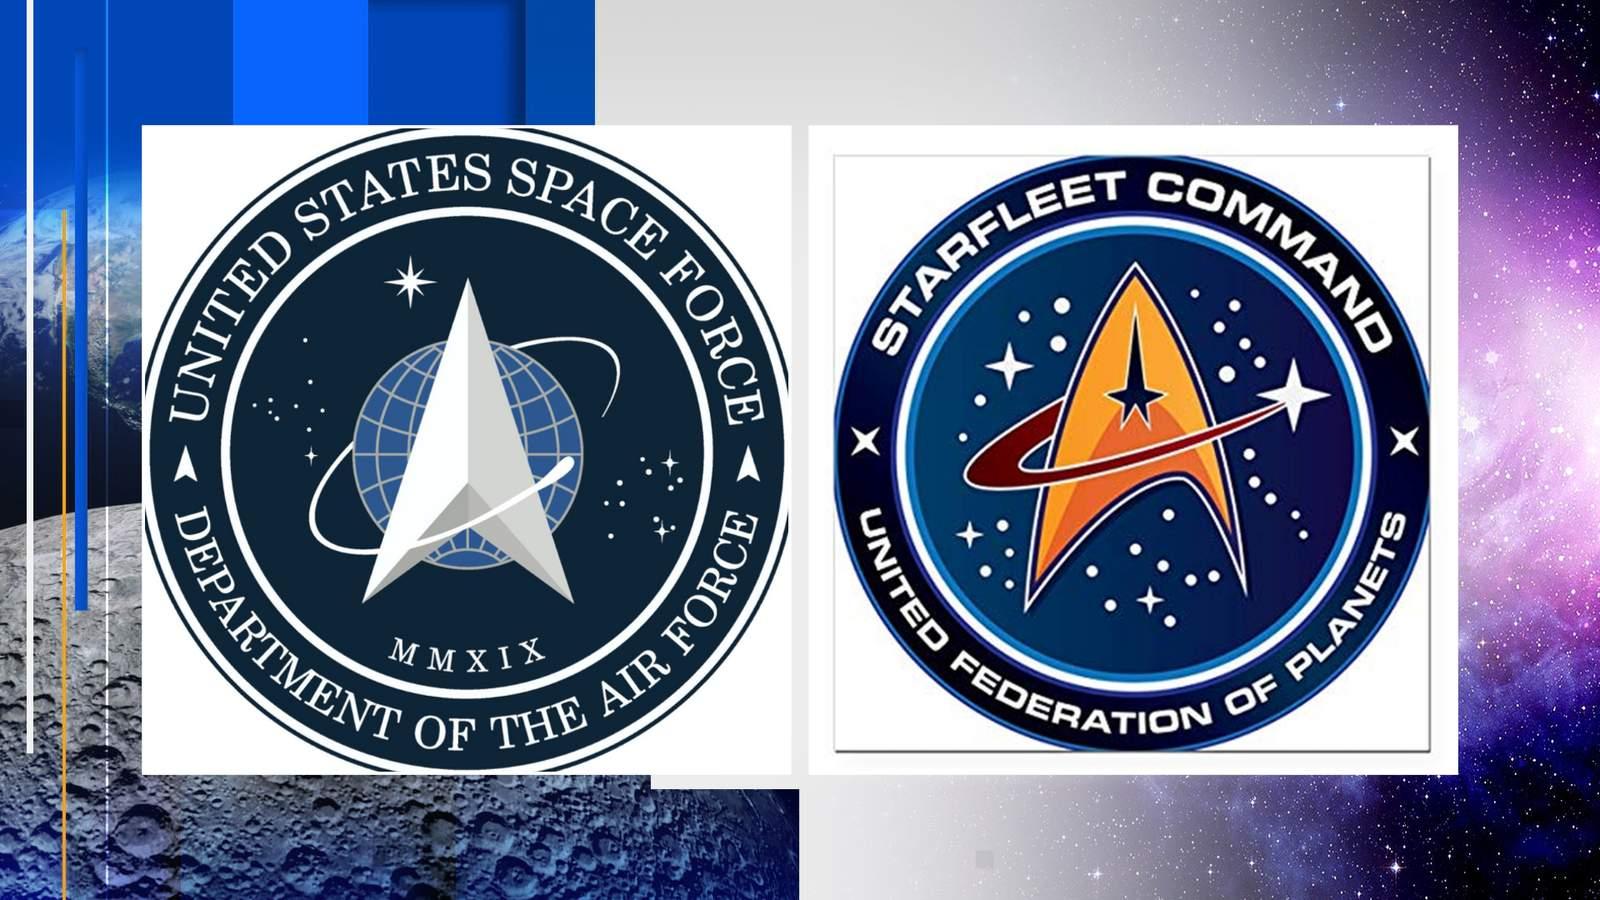 President Trump's Space Force logo looks familiar, 'Star Trek' fans say